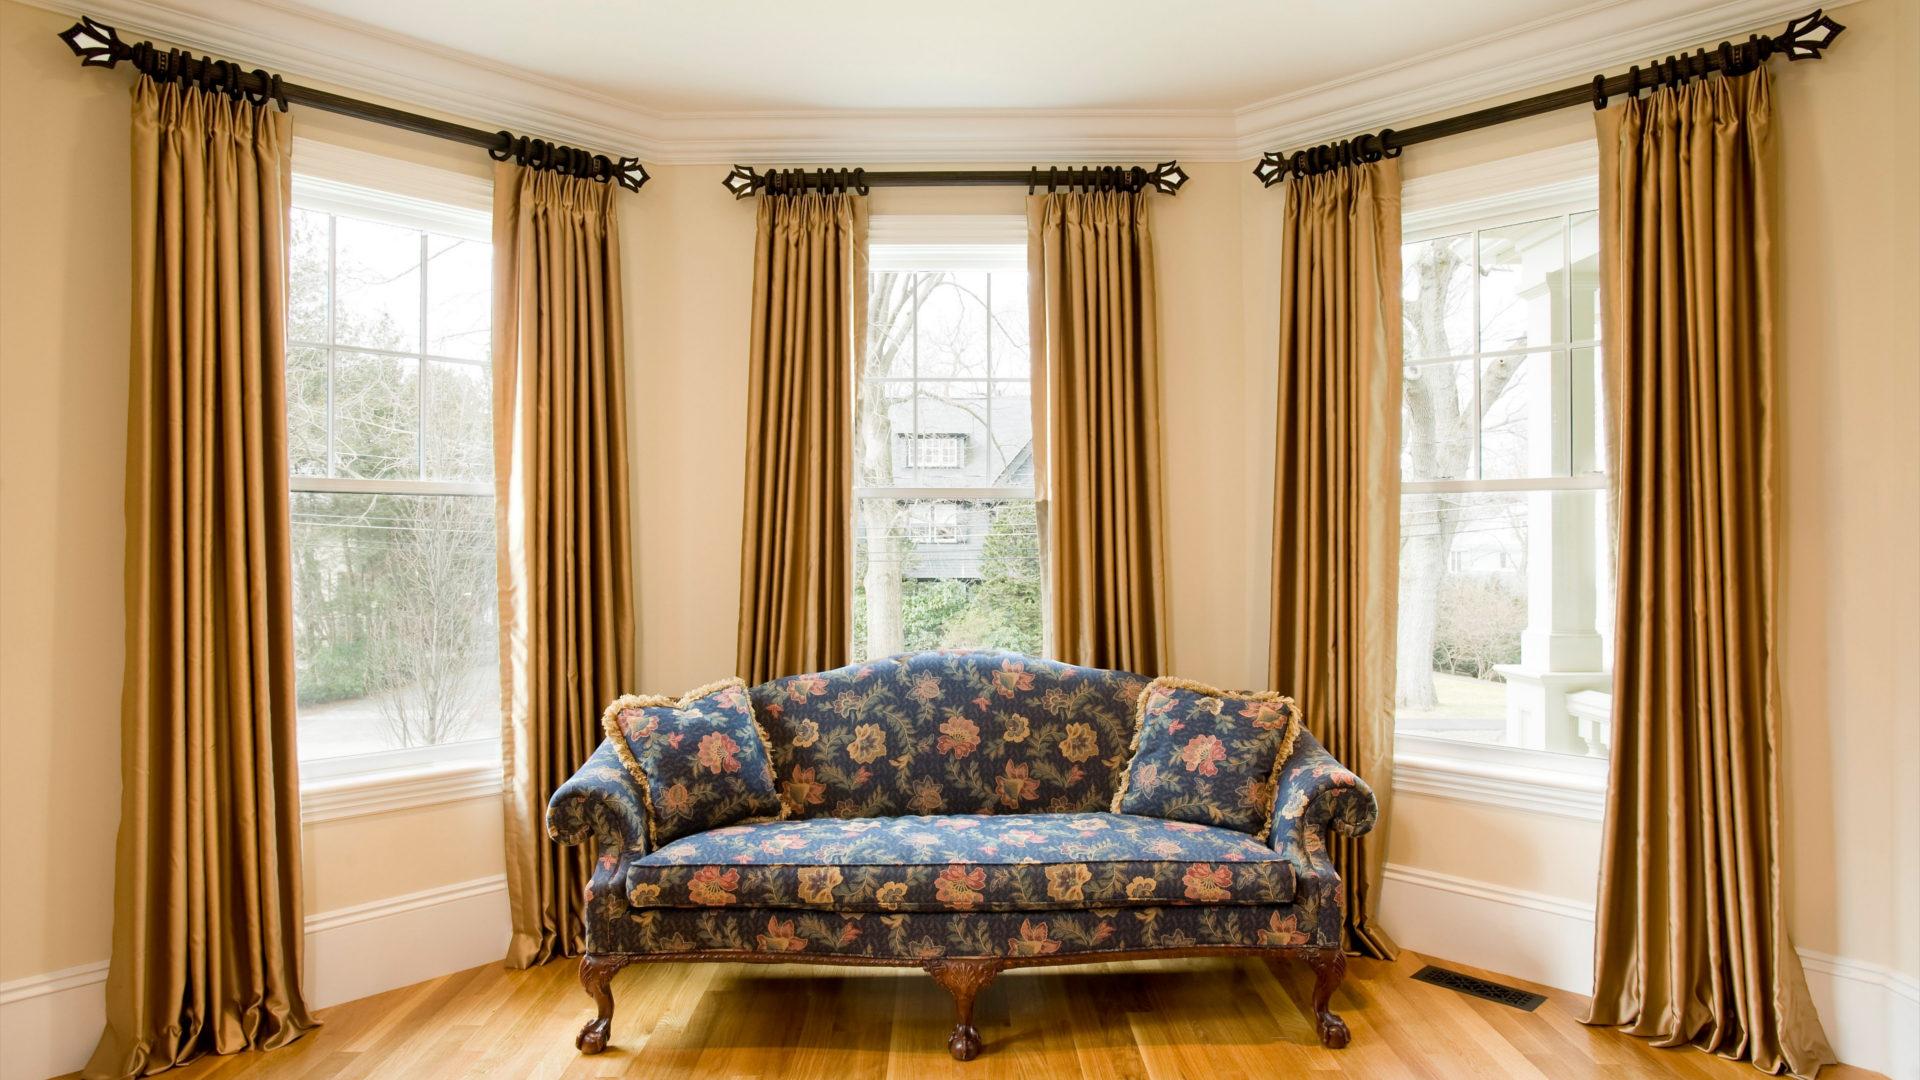 9 Latest Curtain Designs 2017 | Design Trends - Premium ... on Draping Curtains Ideas  id=12368